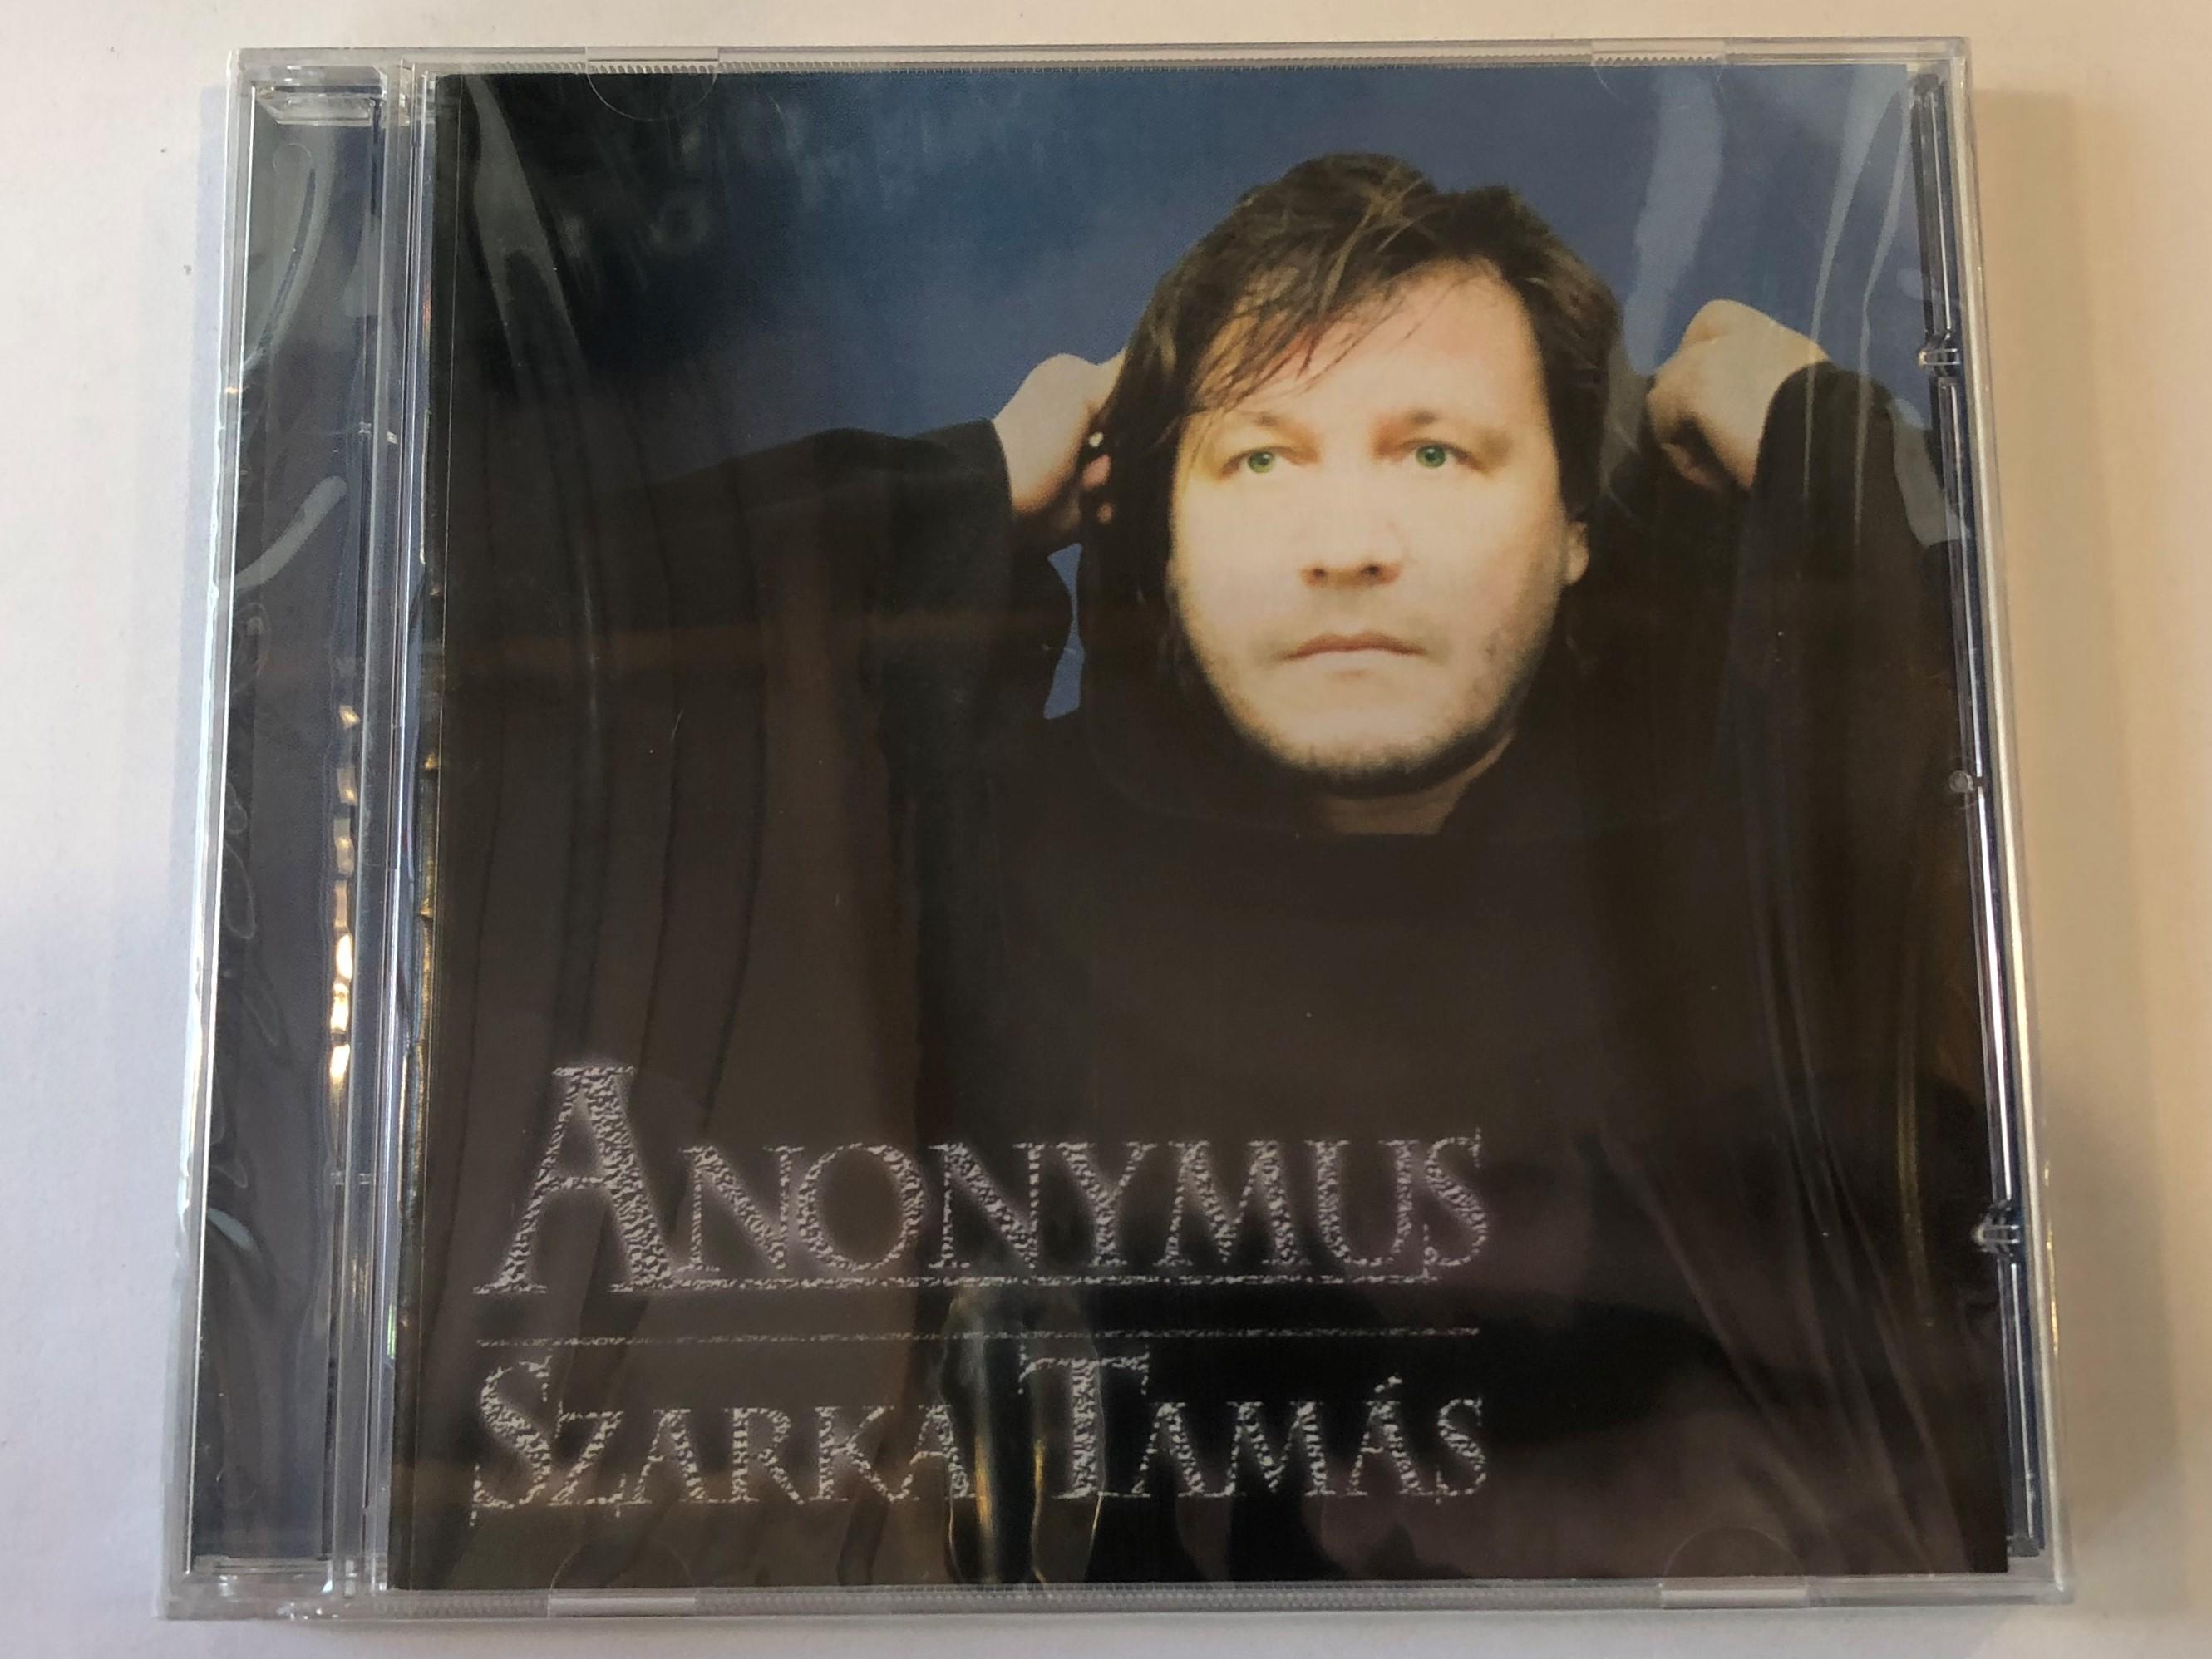 anonymus-szarka-tam-s-rock-hard-records-audio-cd-2004-5998175172415-1-.jpg